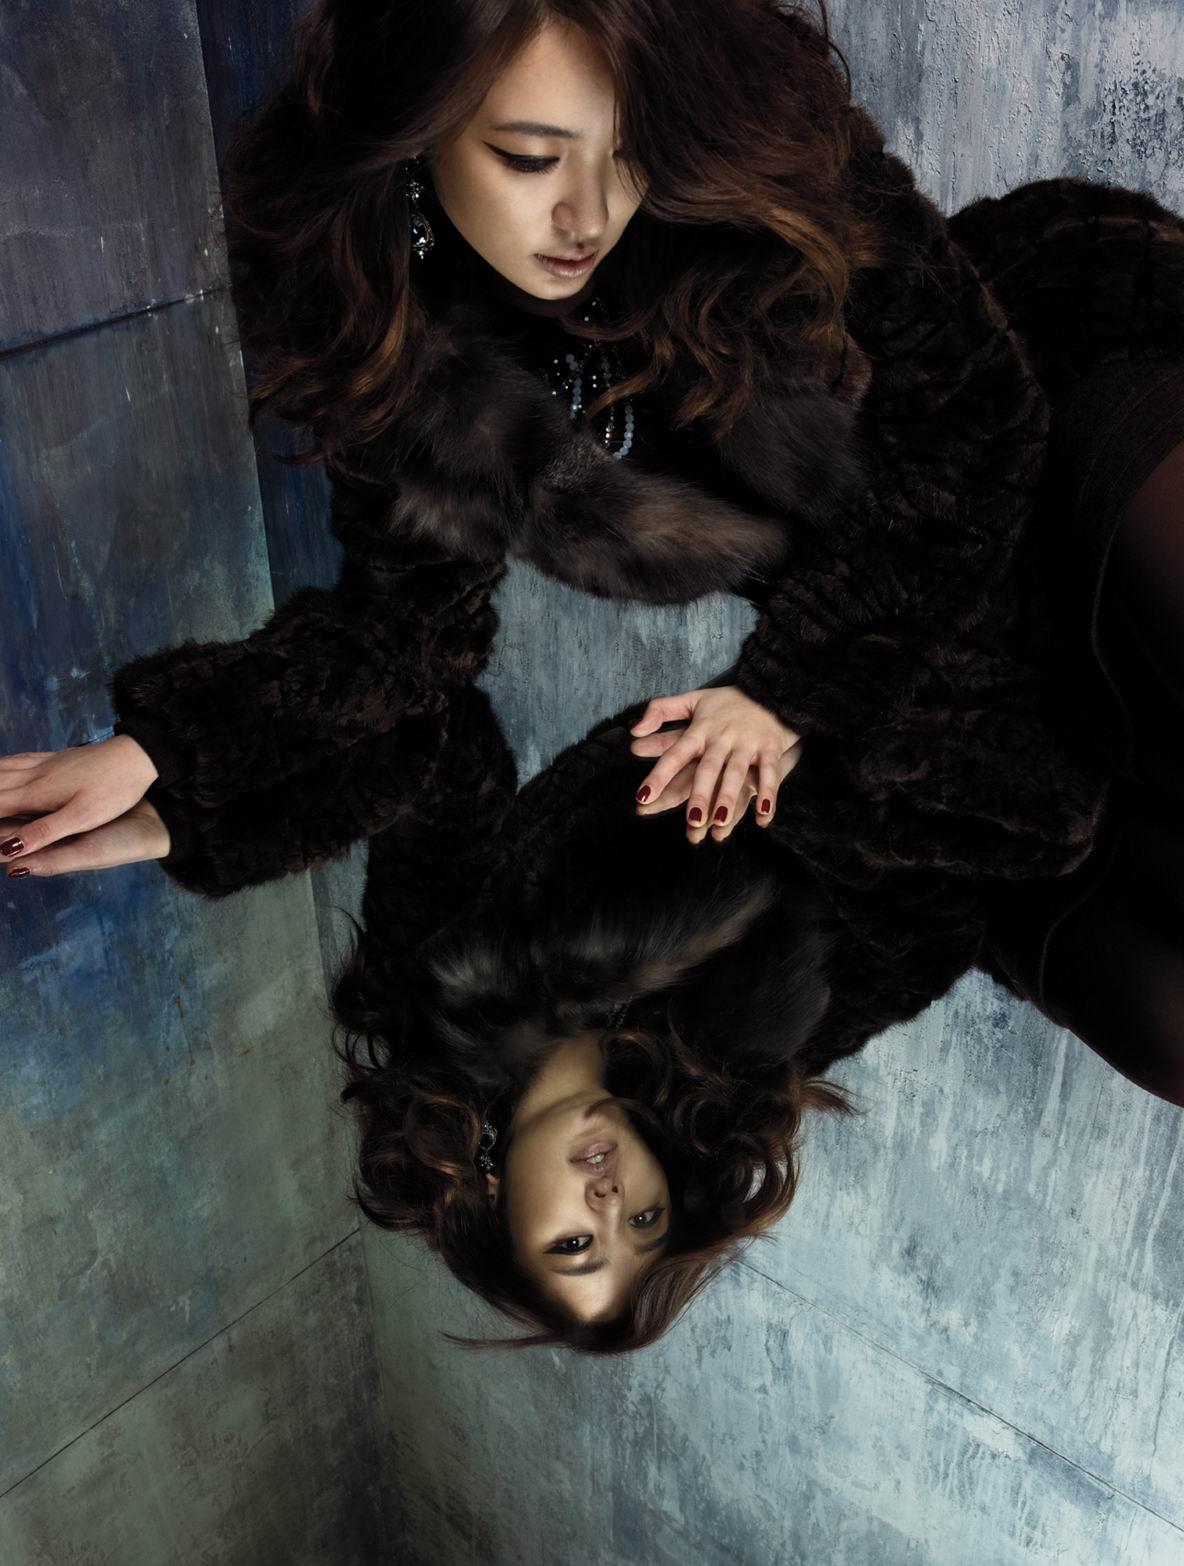 http://1.bp.blogspot.com/_csAyGOQxFJQ/TM5biB0QLbI/AAAAAAAALZg/IKjoXJVKfGQ/s1600/cutekimchi.com_YoonEunHye-1-02.jpg